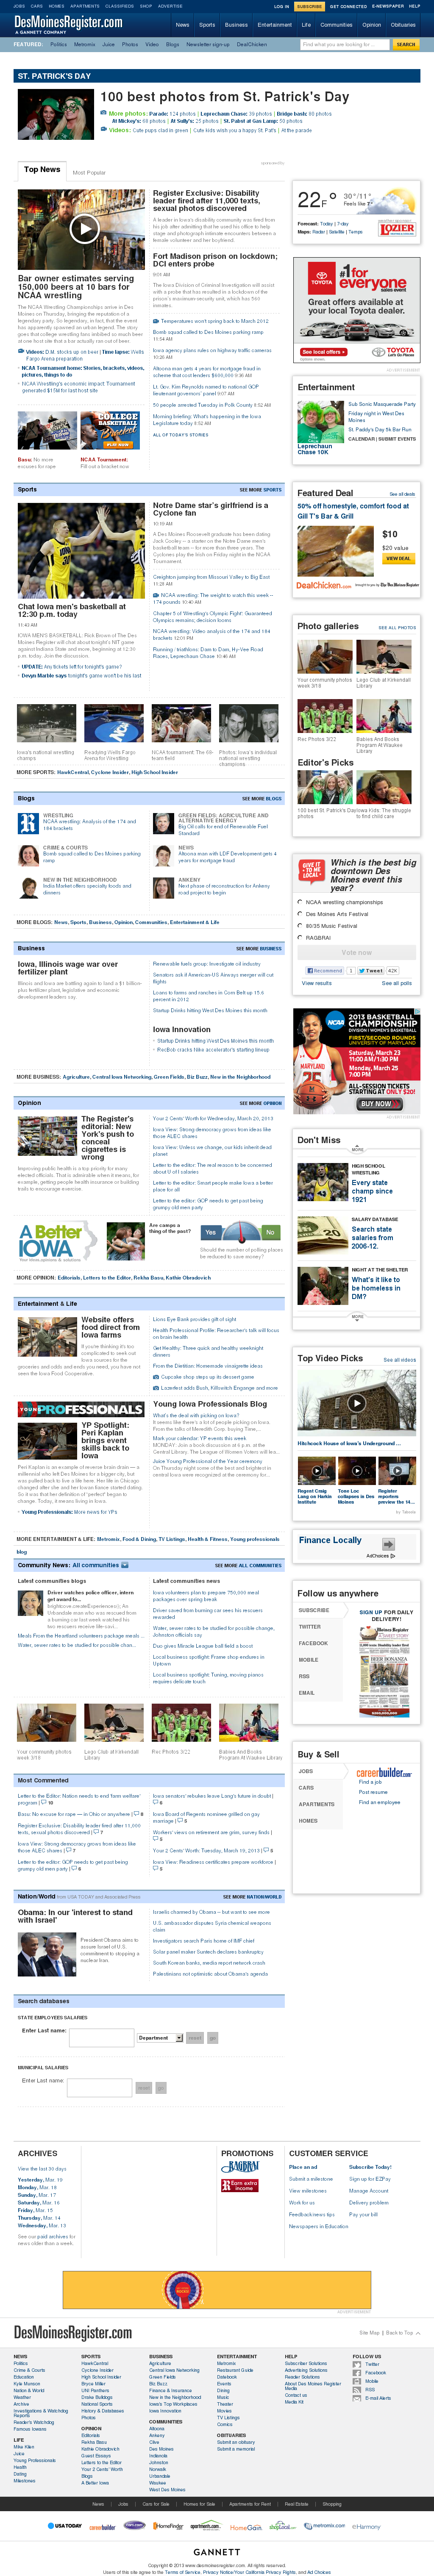 DesMoinesRegister.com at Wednesday March 20, 2013, 5:07 p.m. UTC